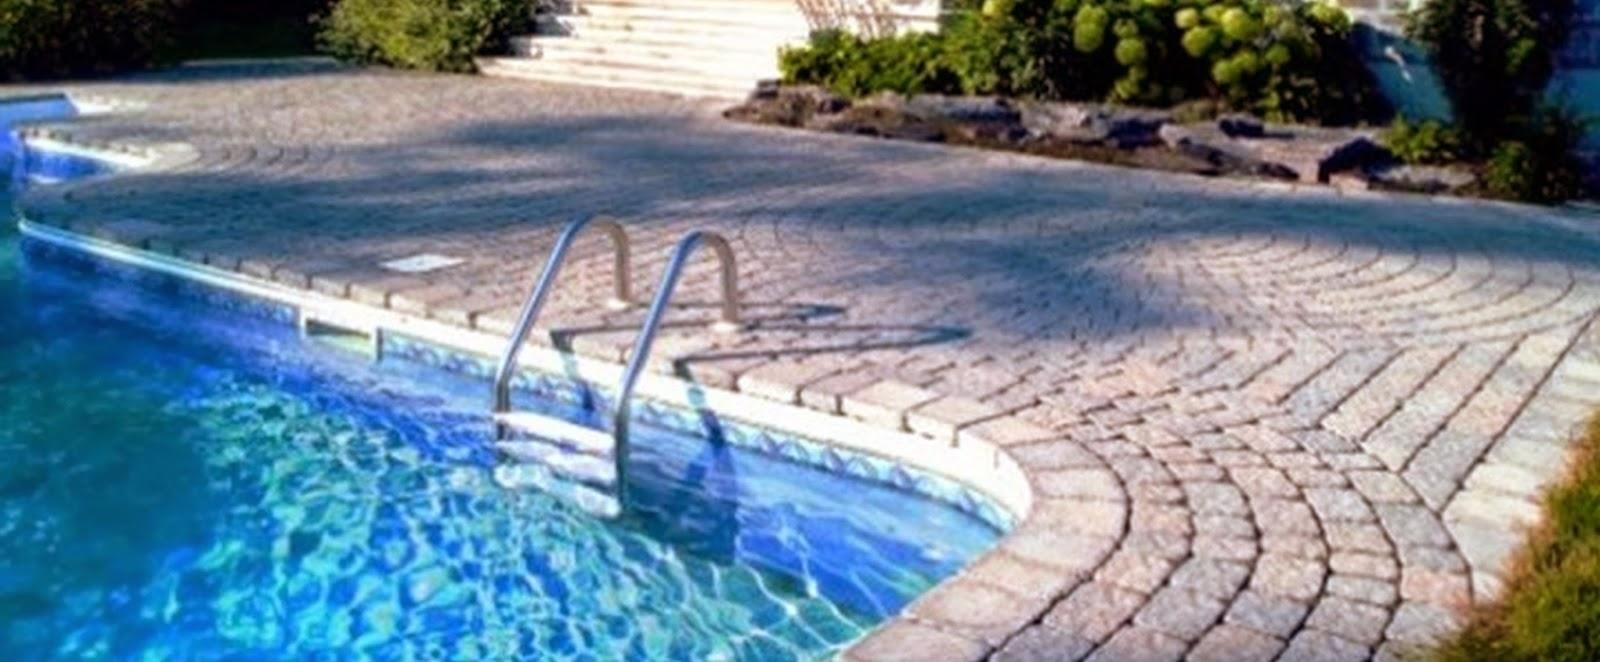 Amazing modern pool deck design for swimming pool design ideas interior design bulletin - Amazing swimming pool designs ...